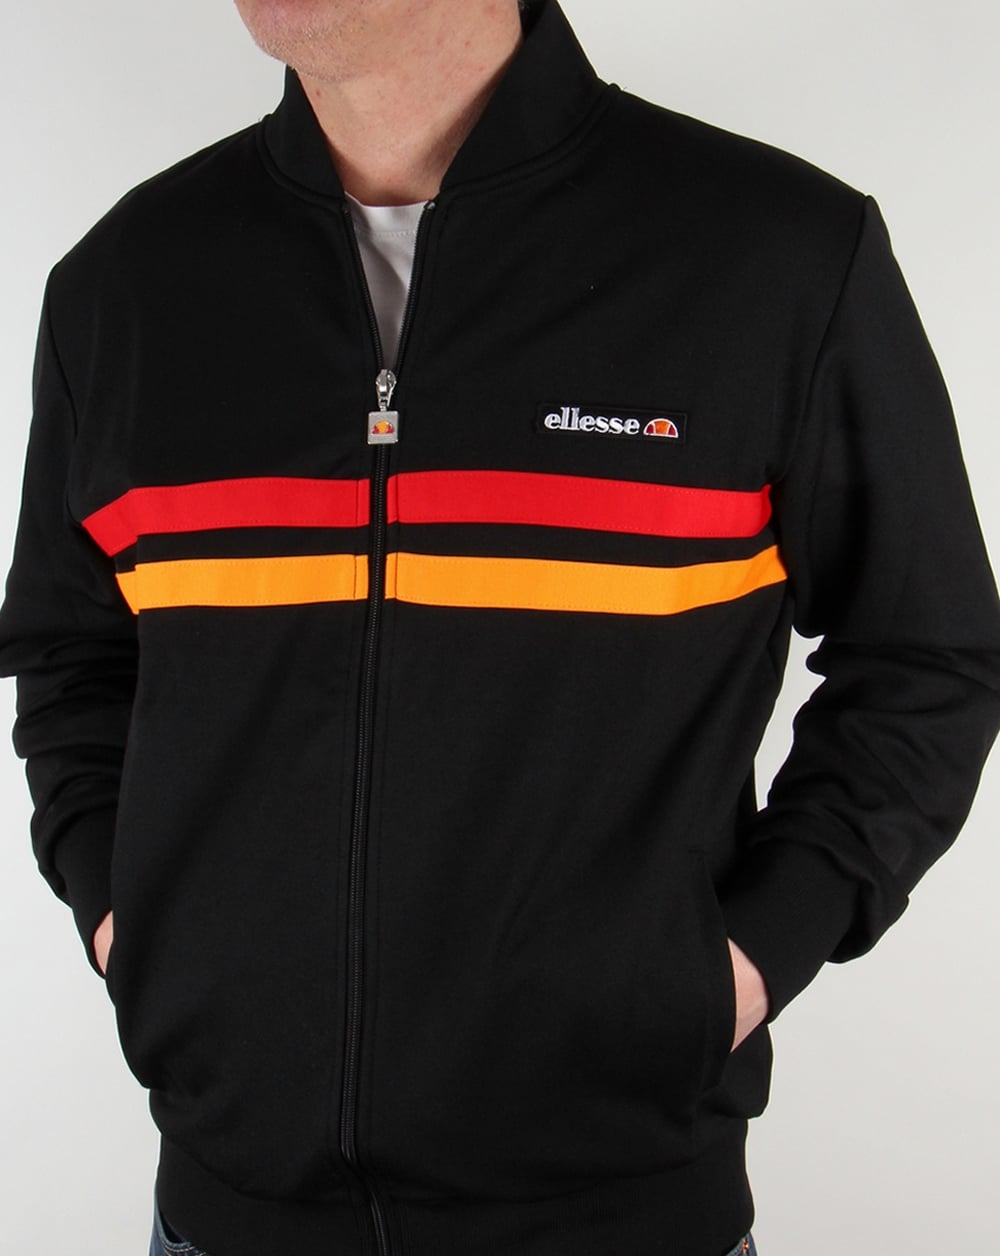 b1ed921ce384 Ellesse Rimini 2 Track Top Black/red/orange,tracksuit,jacket,mens